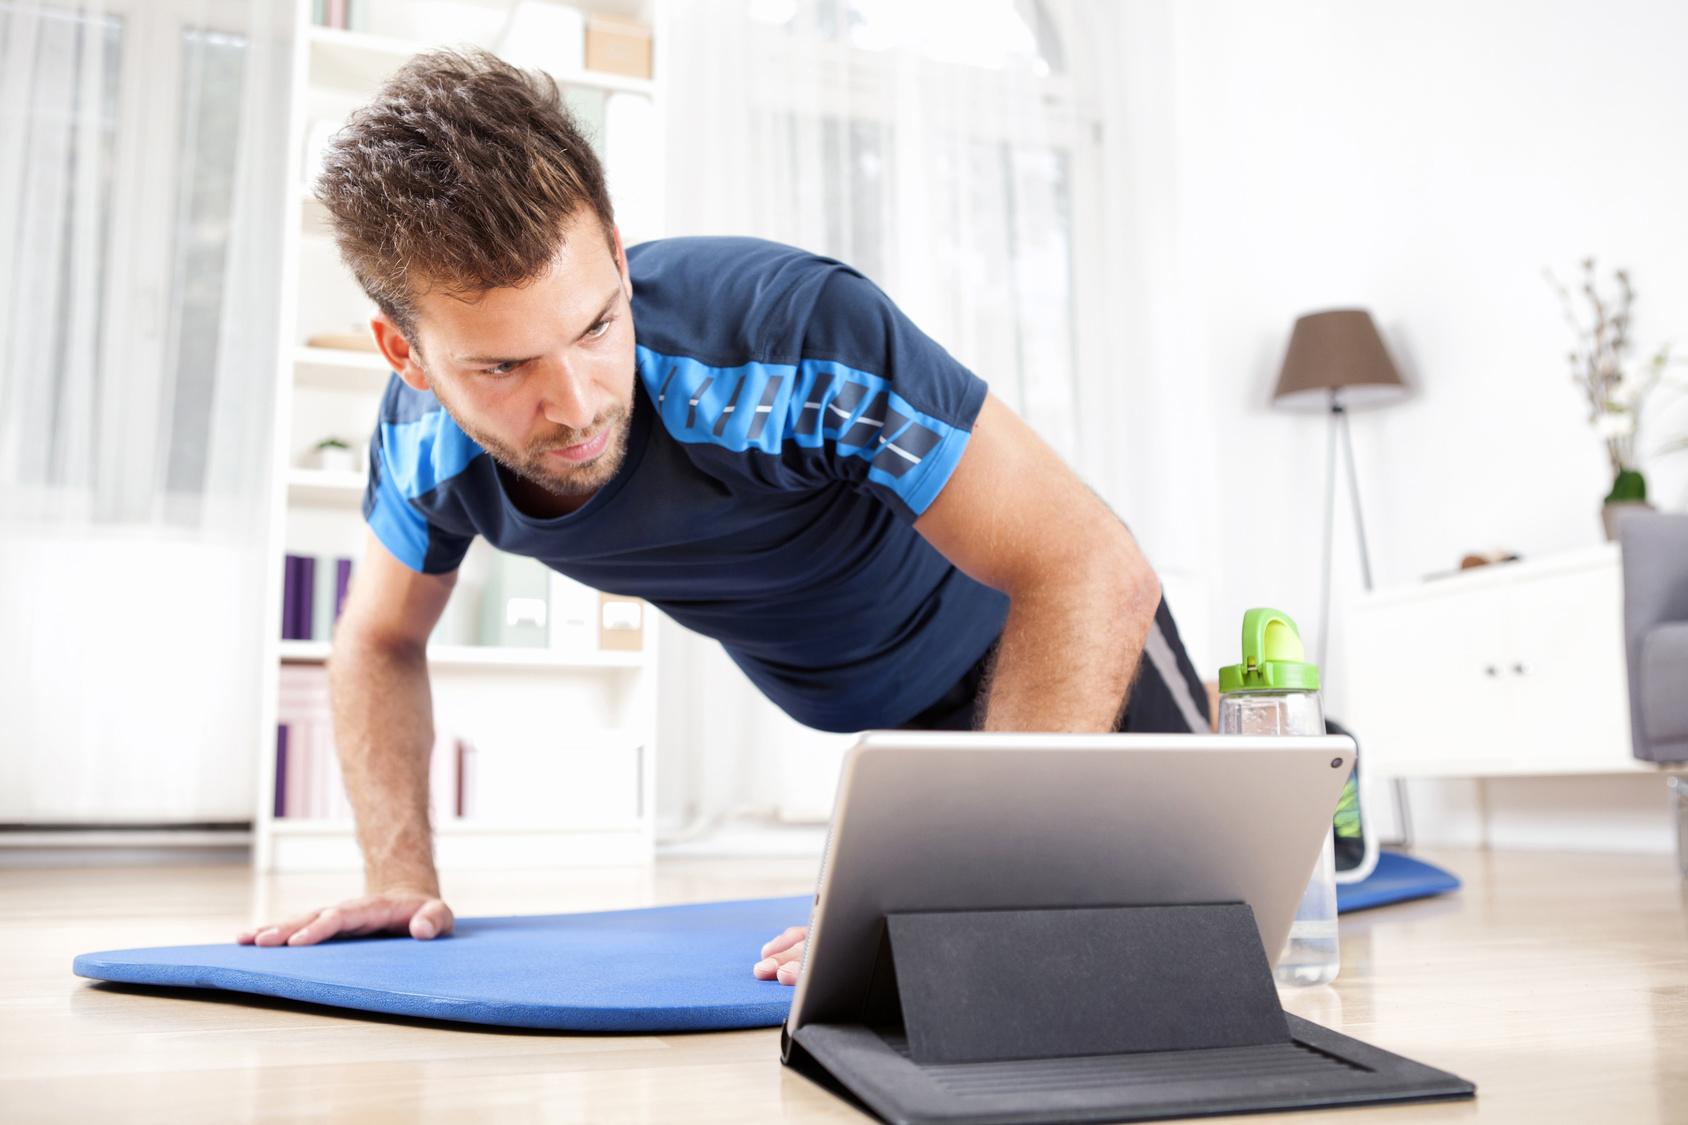 Online fitness training using Laptop